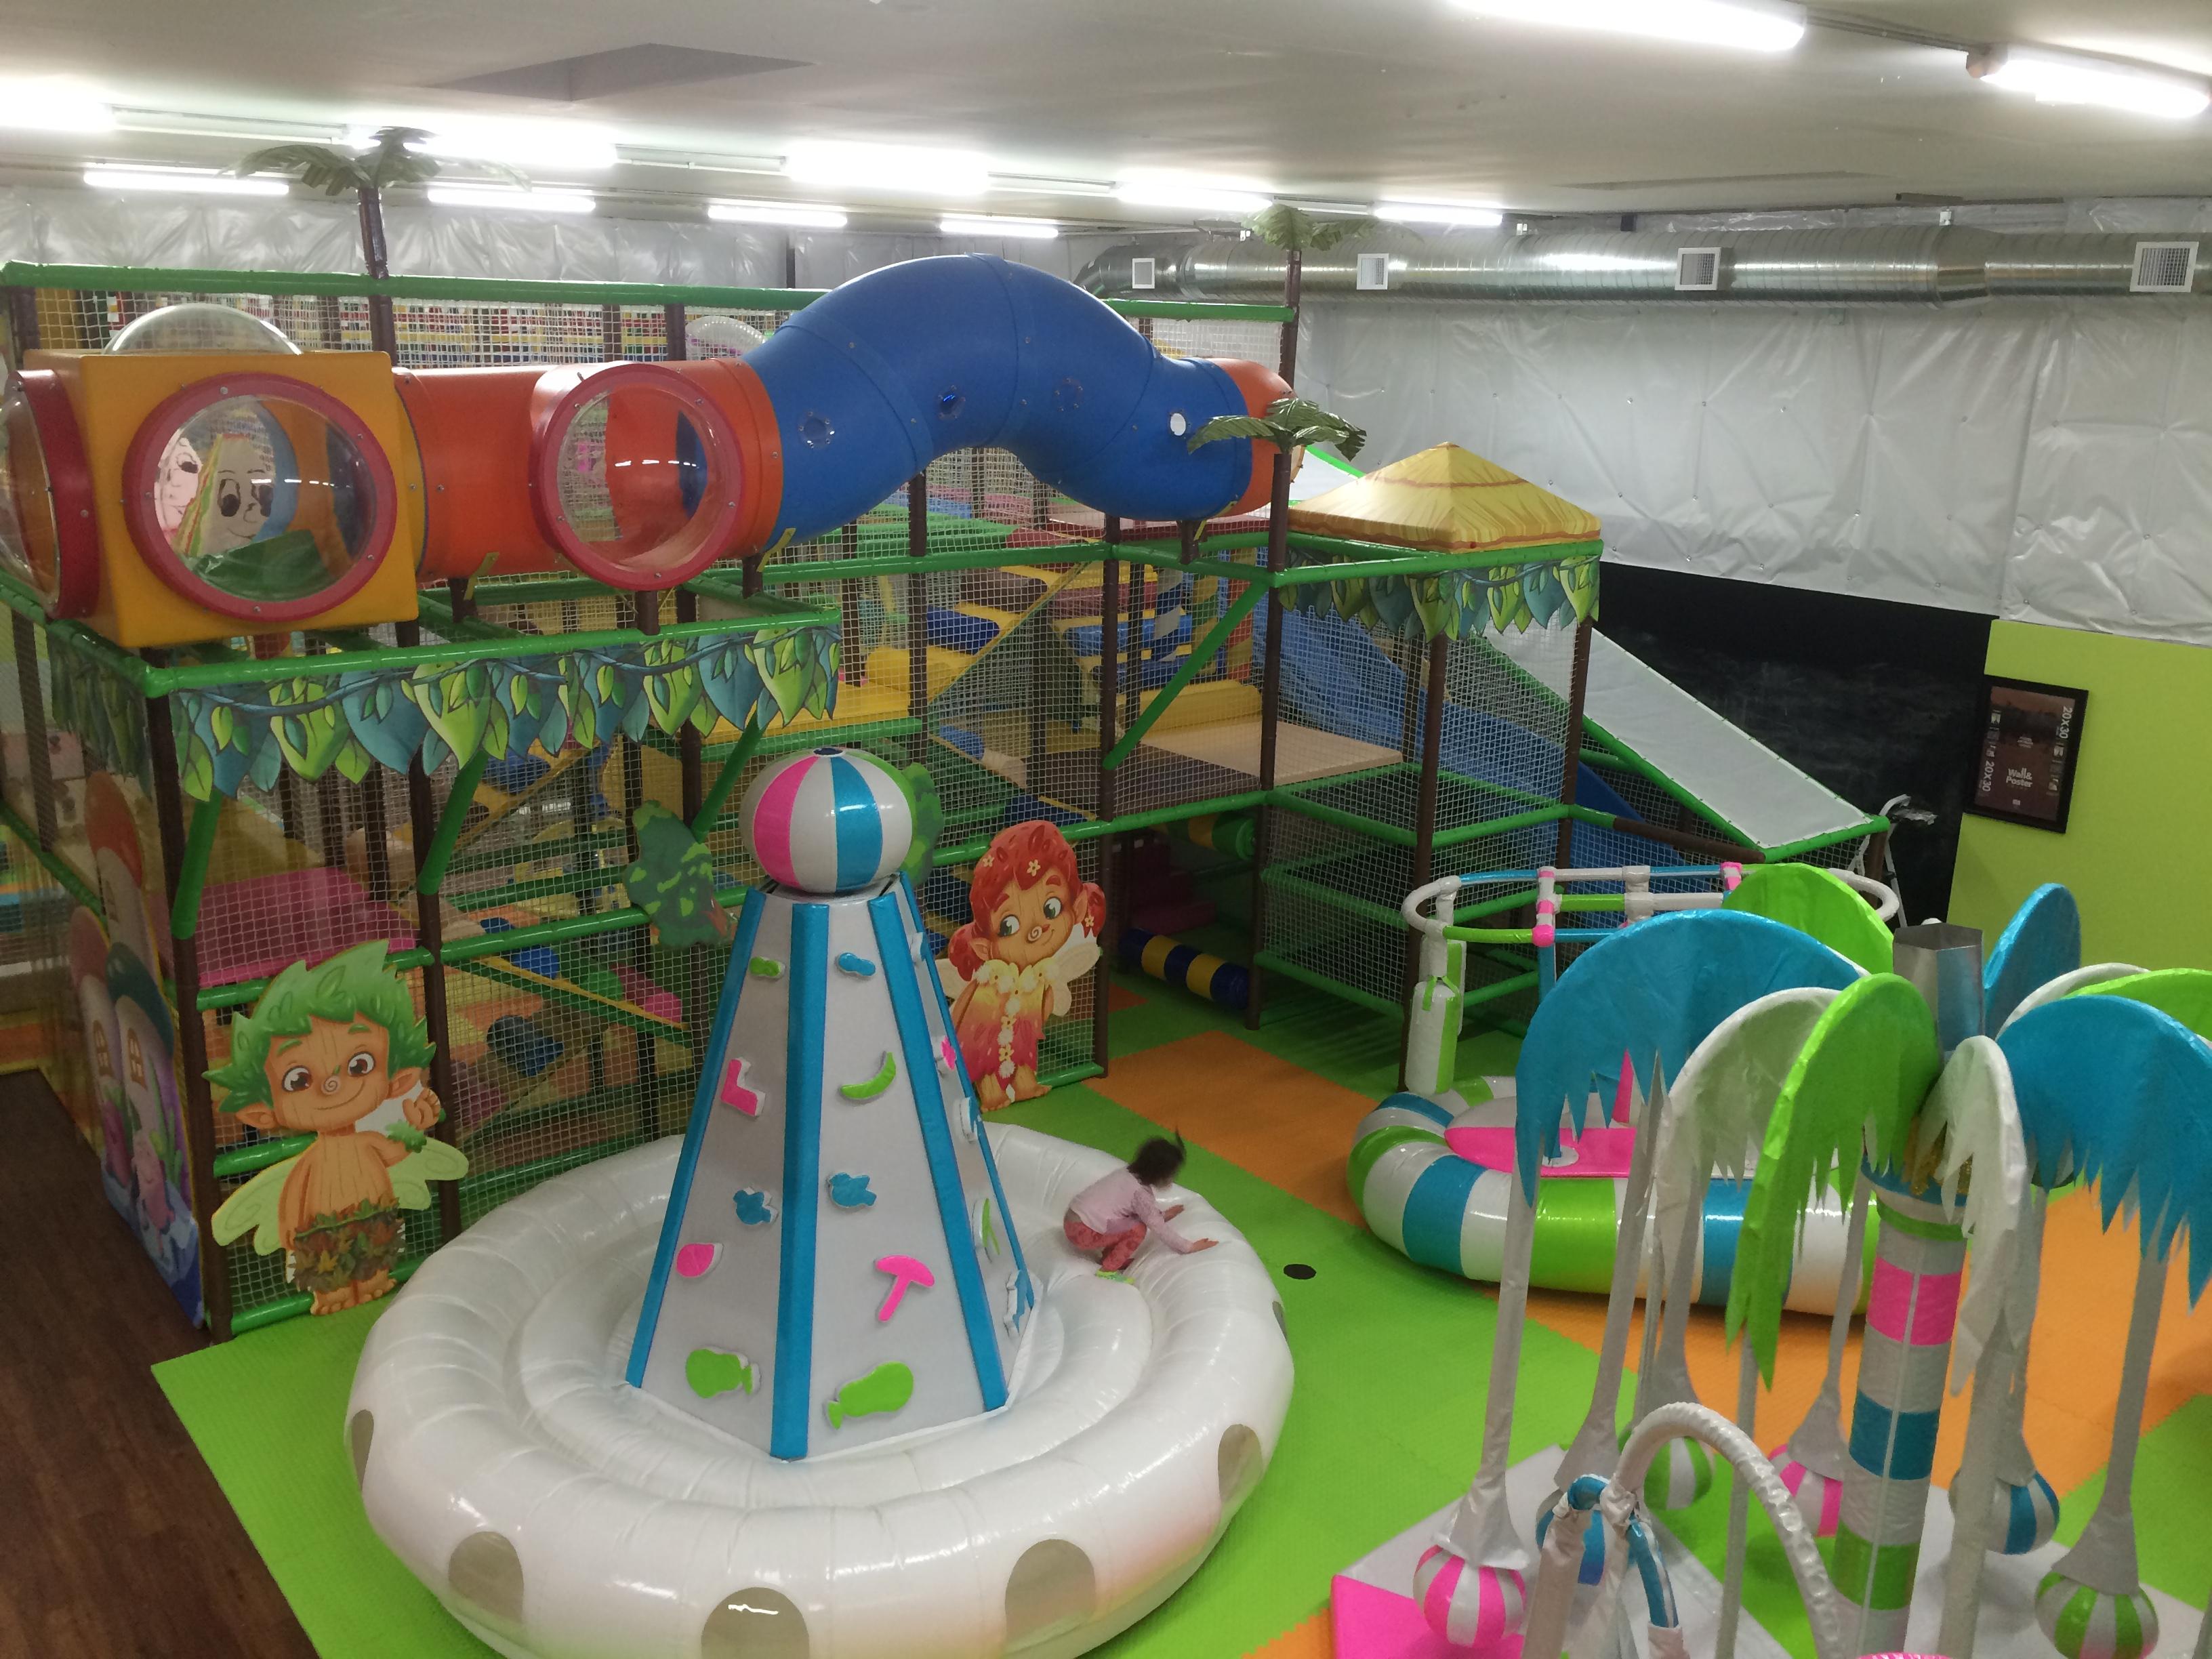 Juzplaykids Indoor Playground I 90 Exit 15 Issaquah